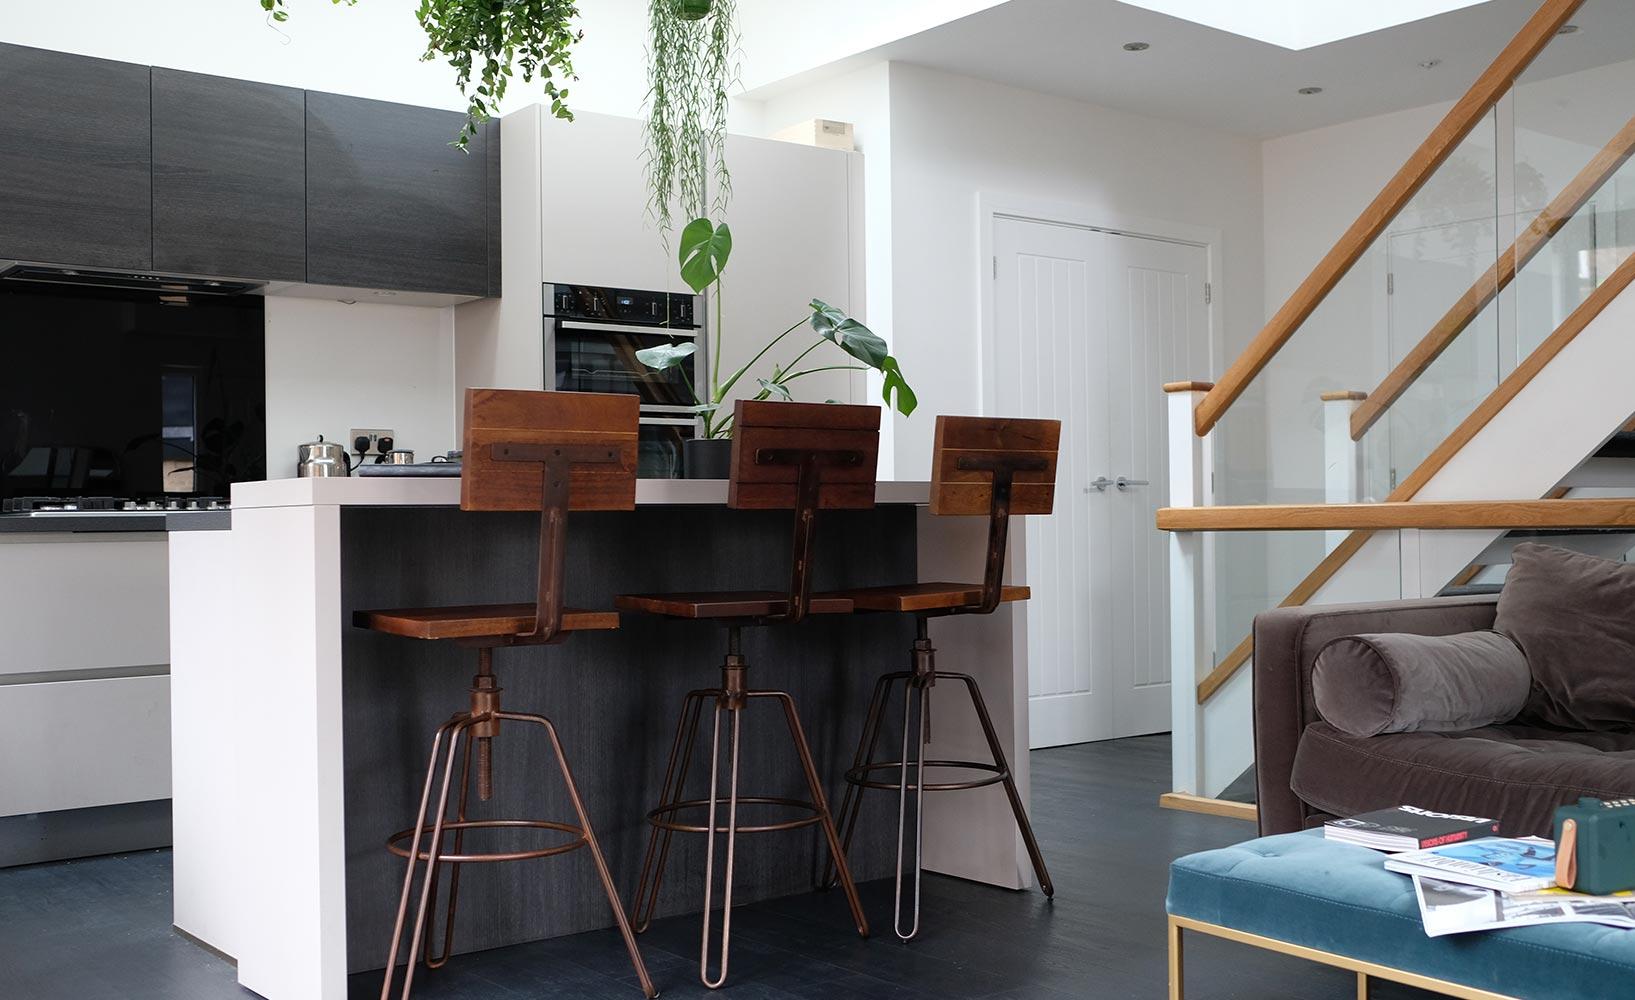 Elegant Ikea Stuhle Fotos Von Wohndesign Dekorativ